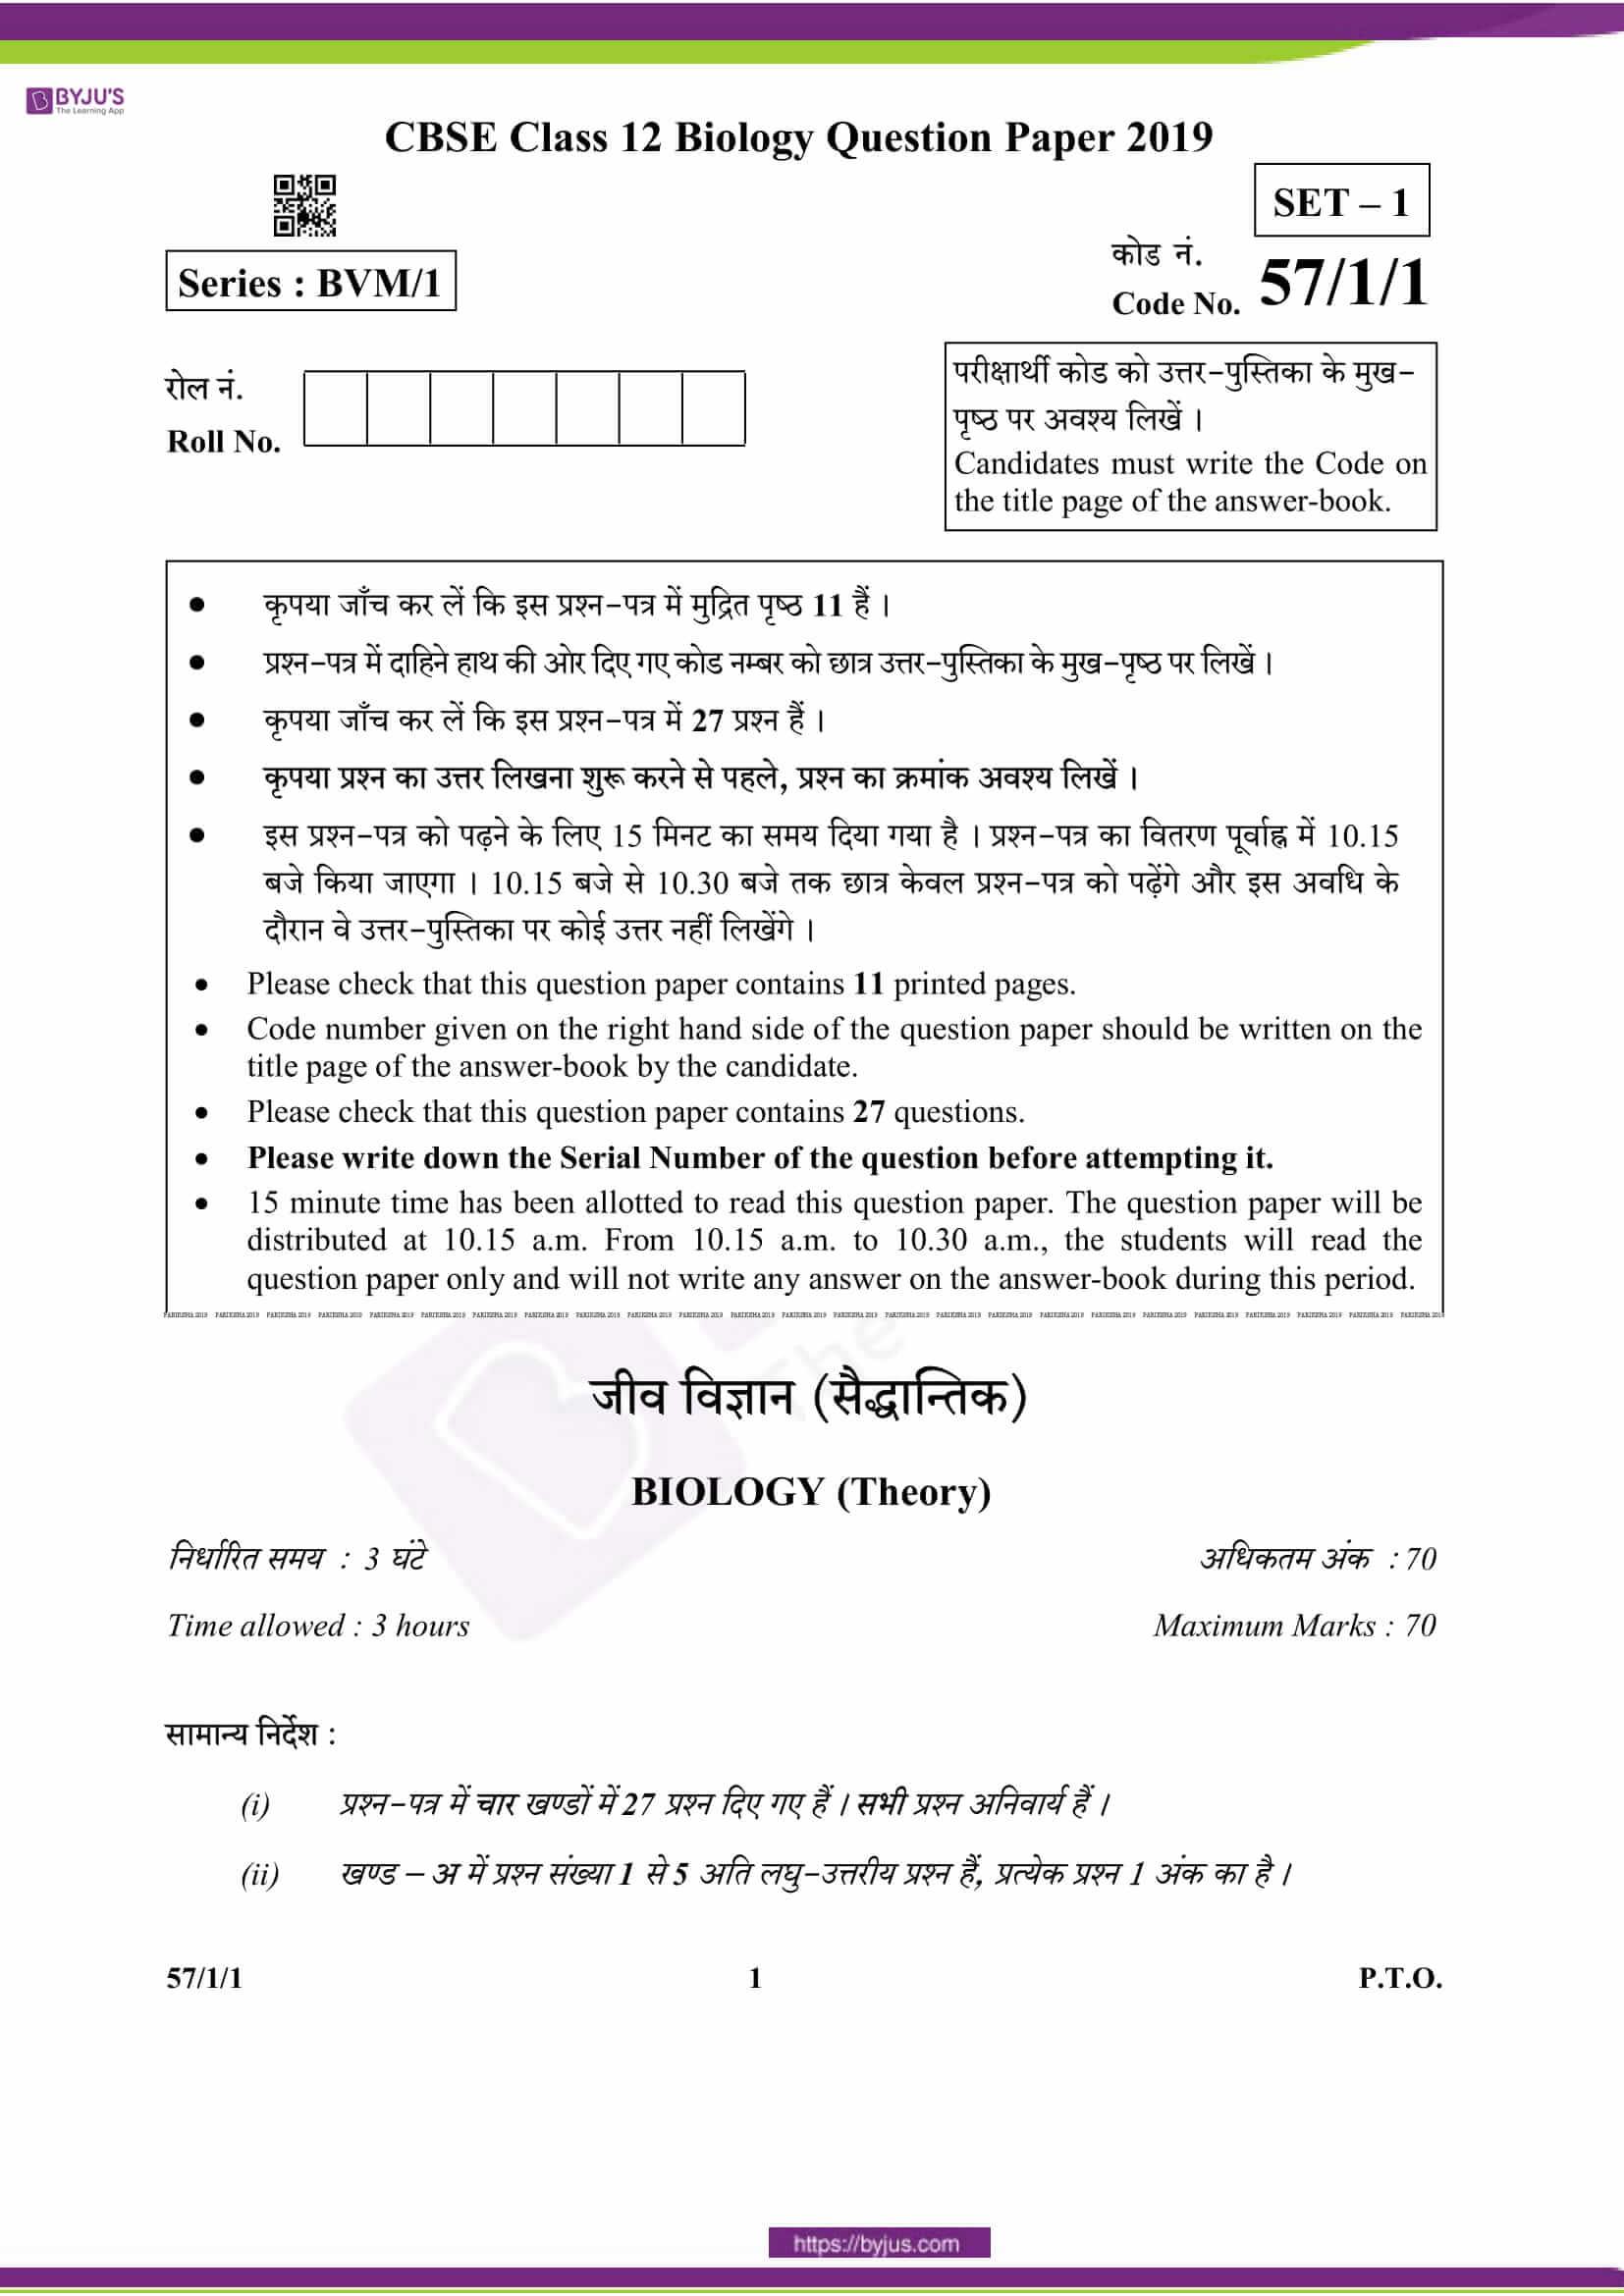 cbse class 12 qs paper 2019 bio set 1